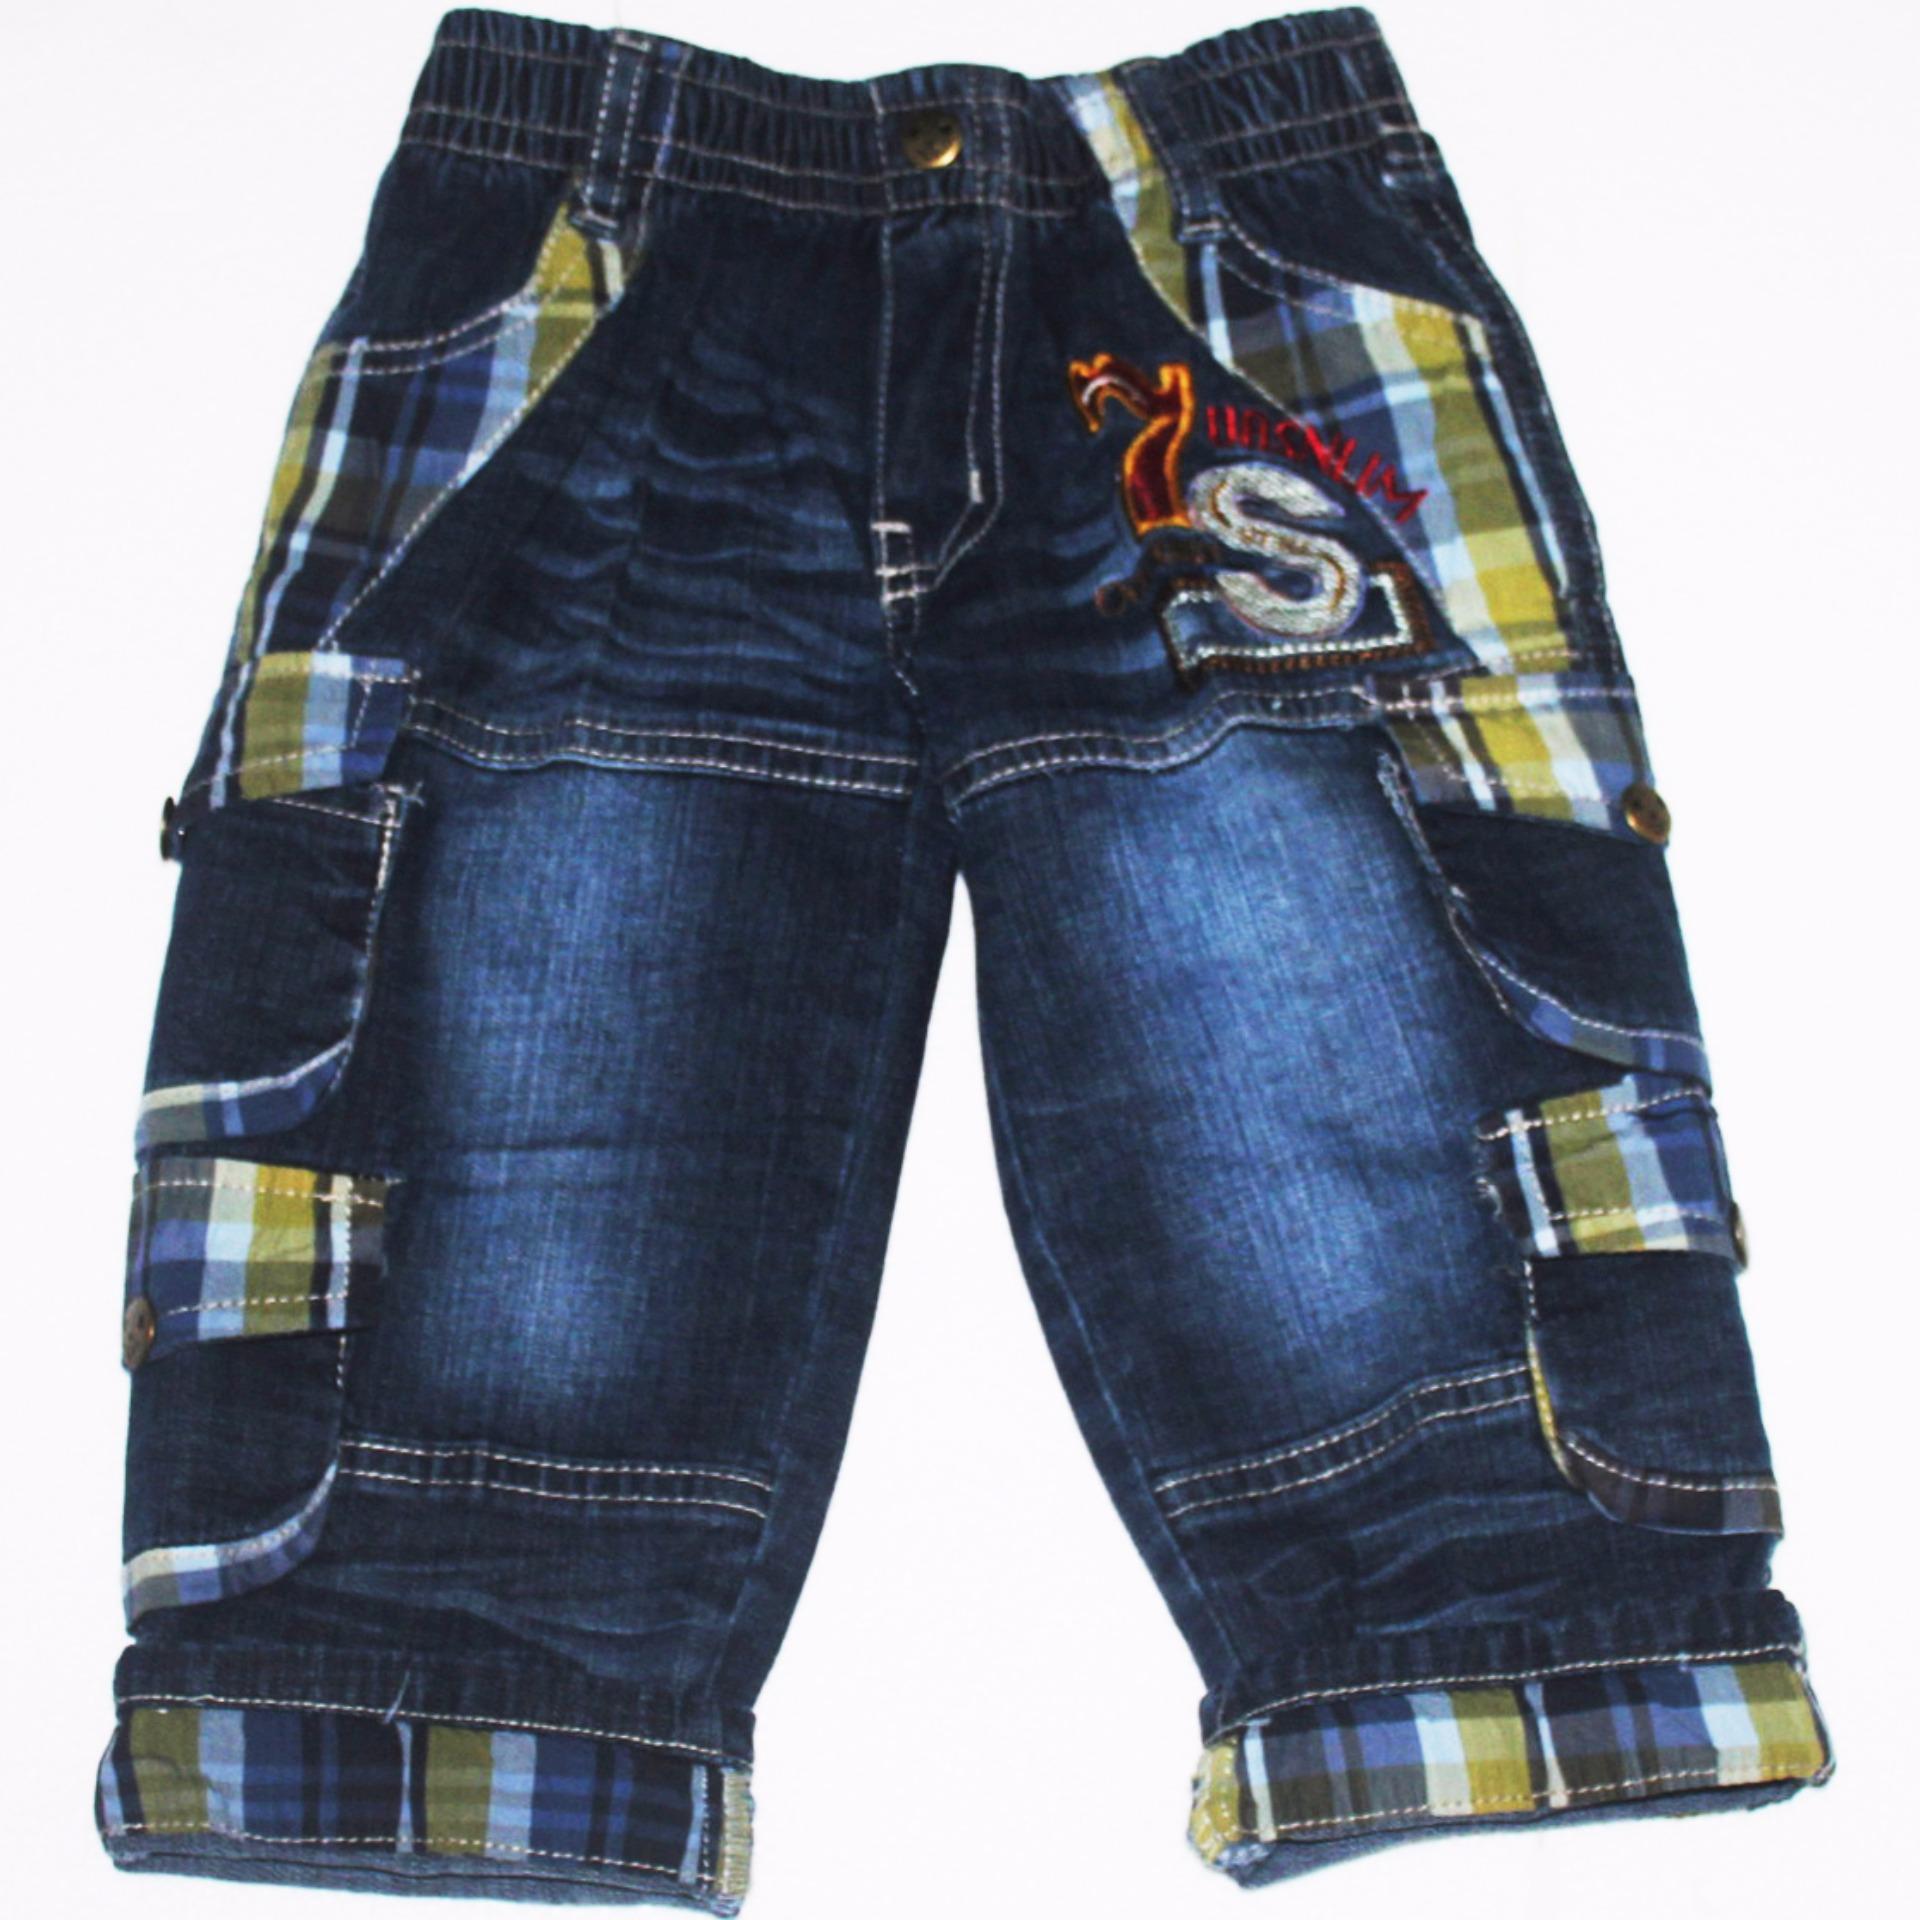 Quần jean dài bé trai 14-29KG từ 1 đến 8 tuổi TRI LAN QDBT010